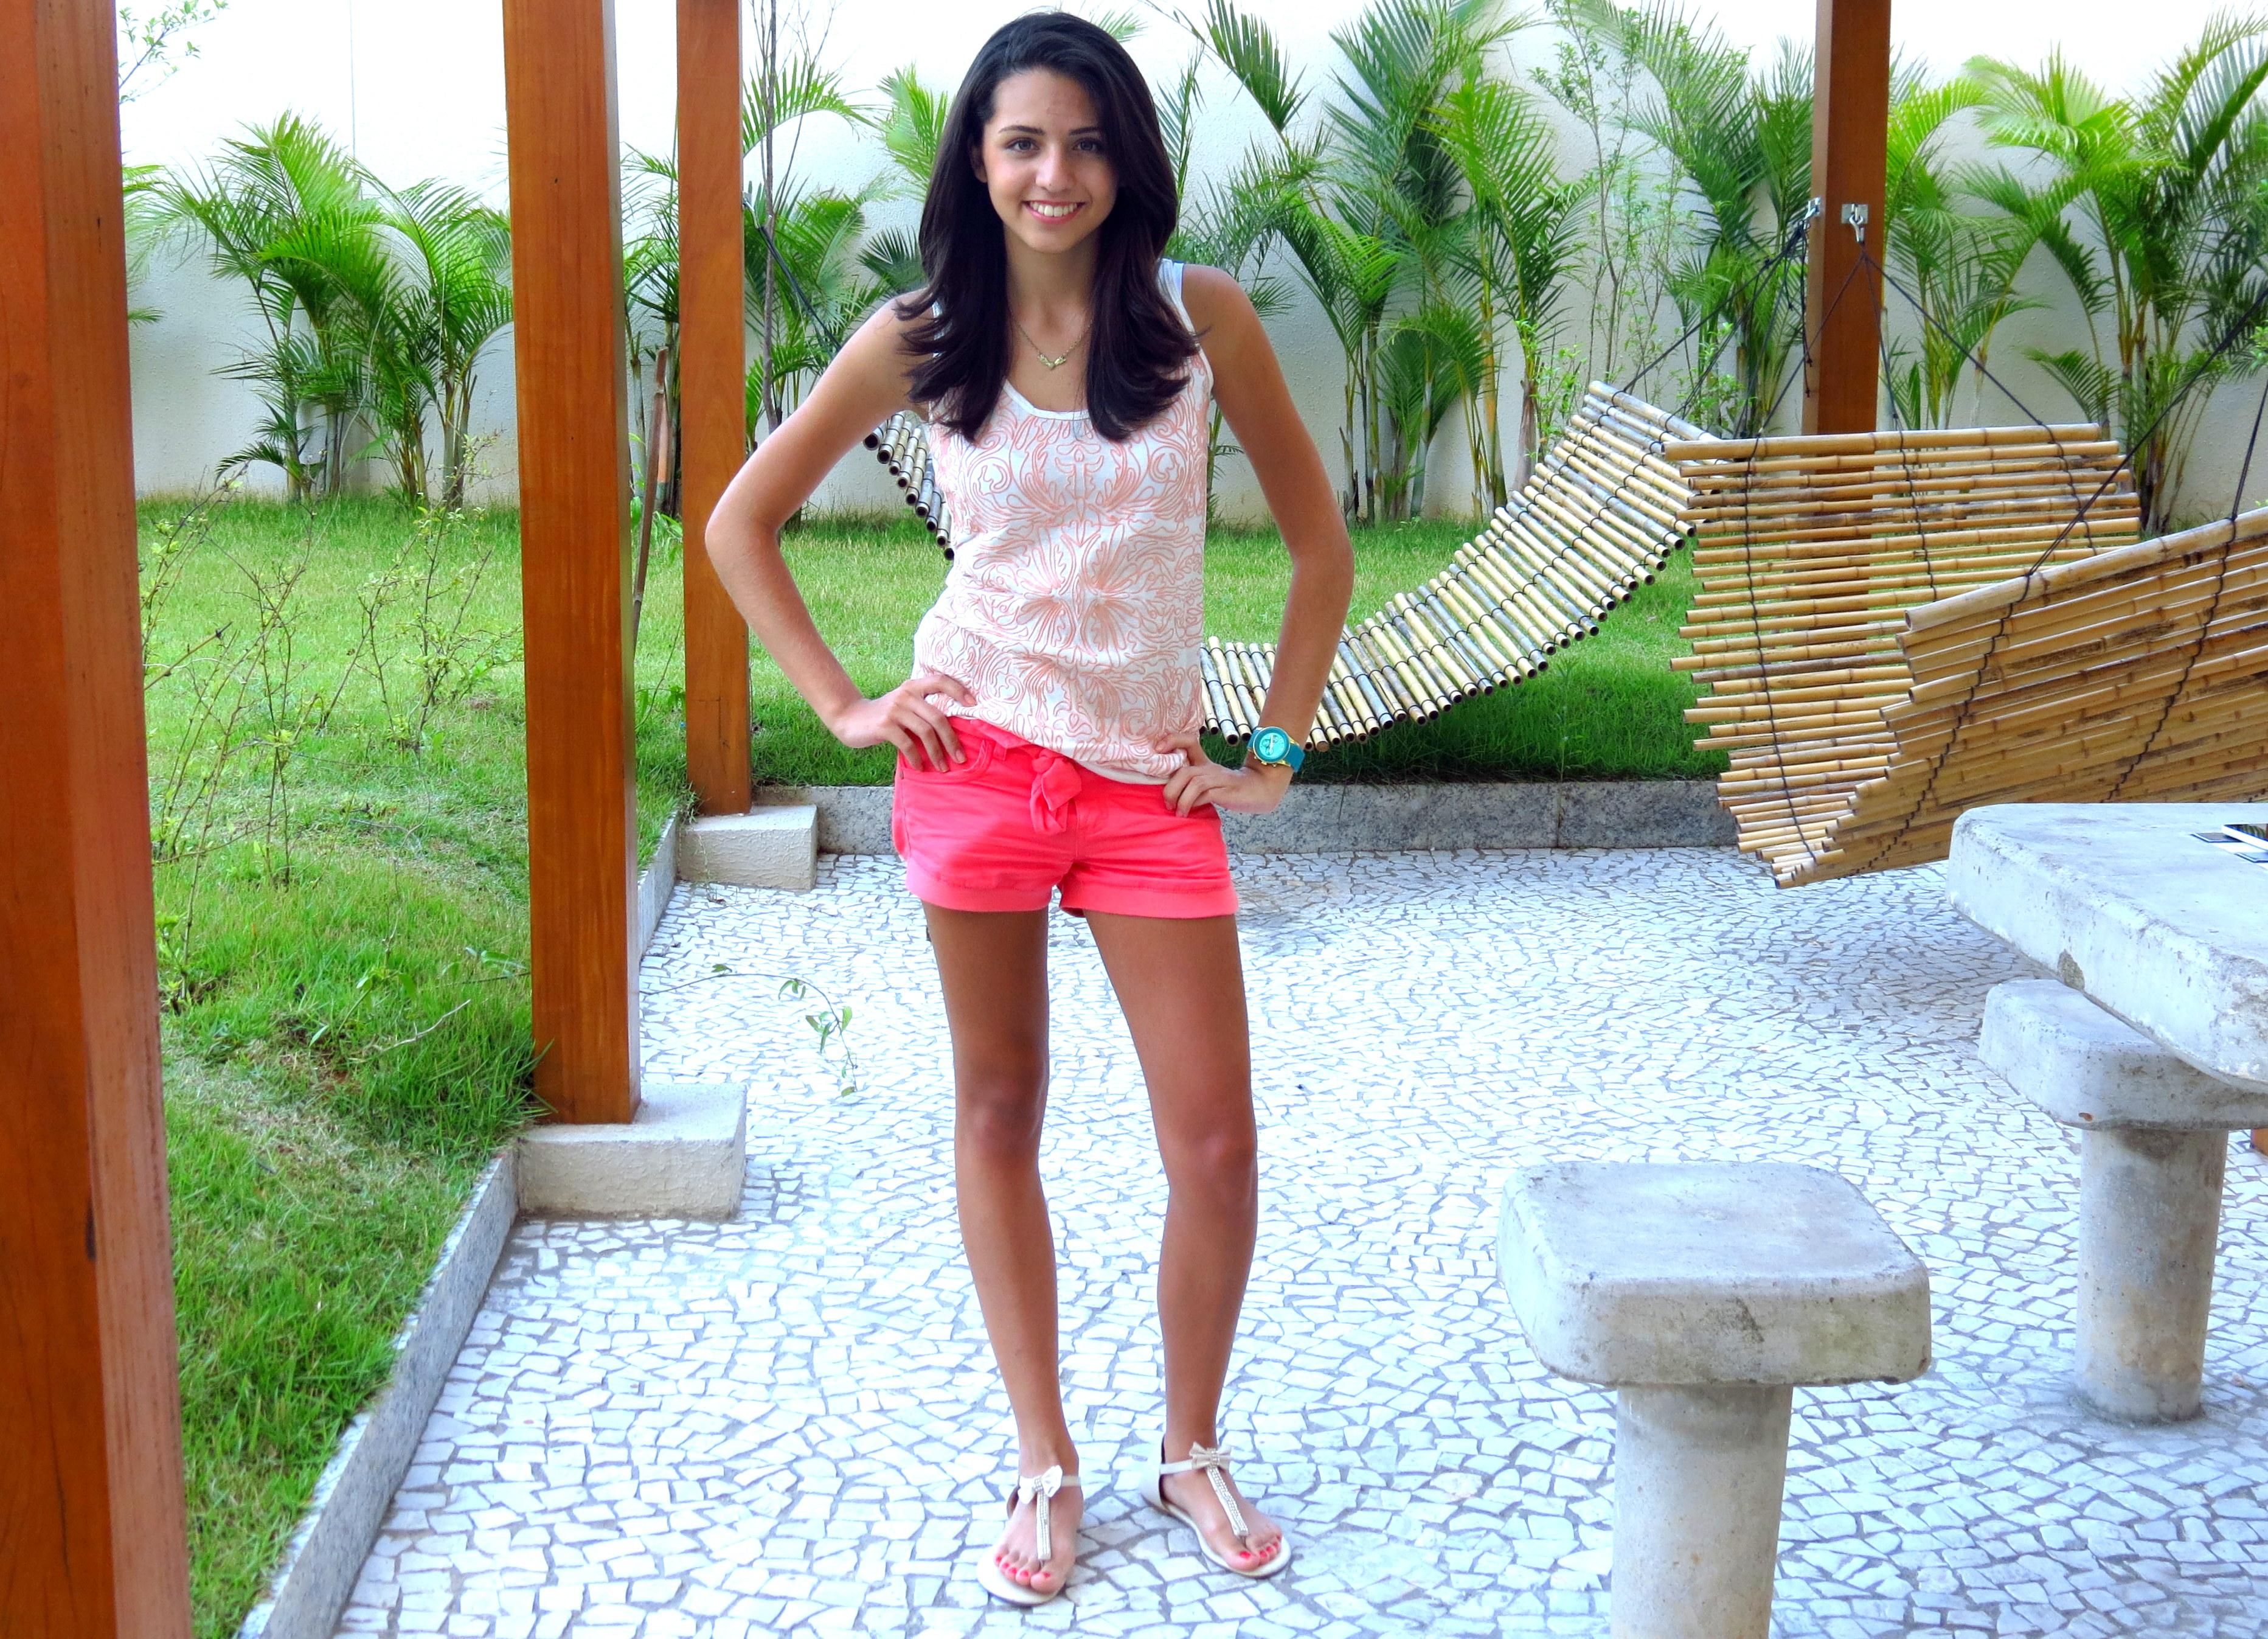 look do dia dia a dia shorts curtos coloridos trend laranja rosa magra  pernas finas elegante 0eb2c3a63fdb2